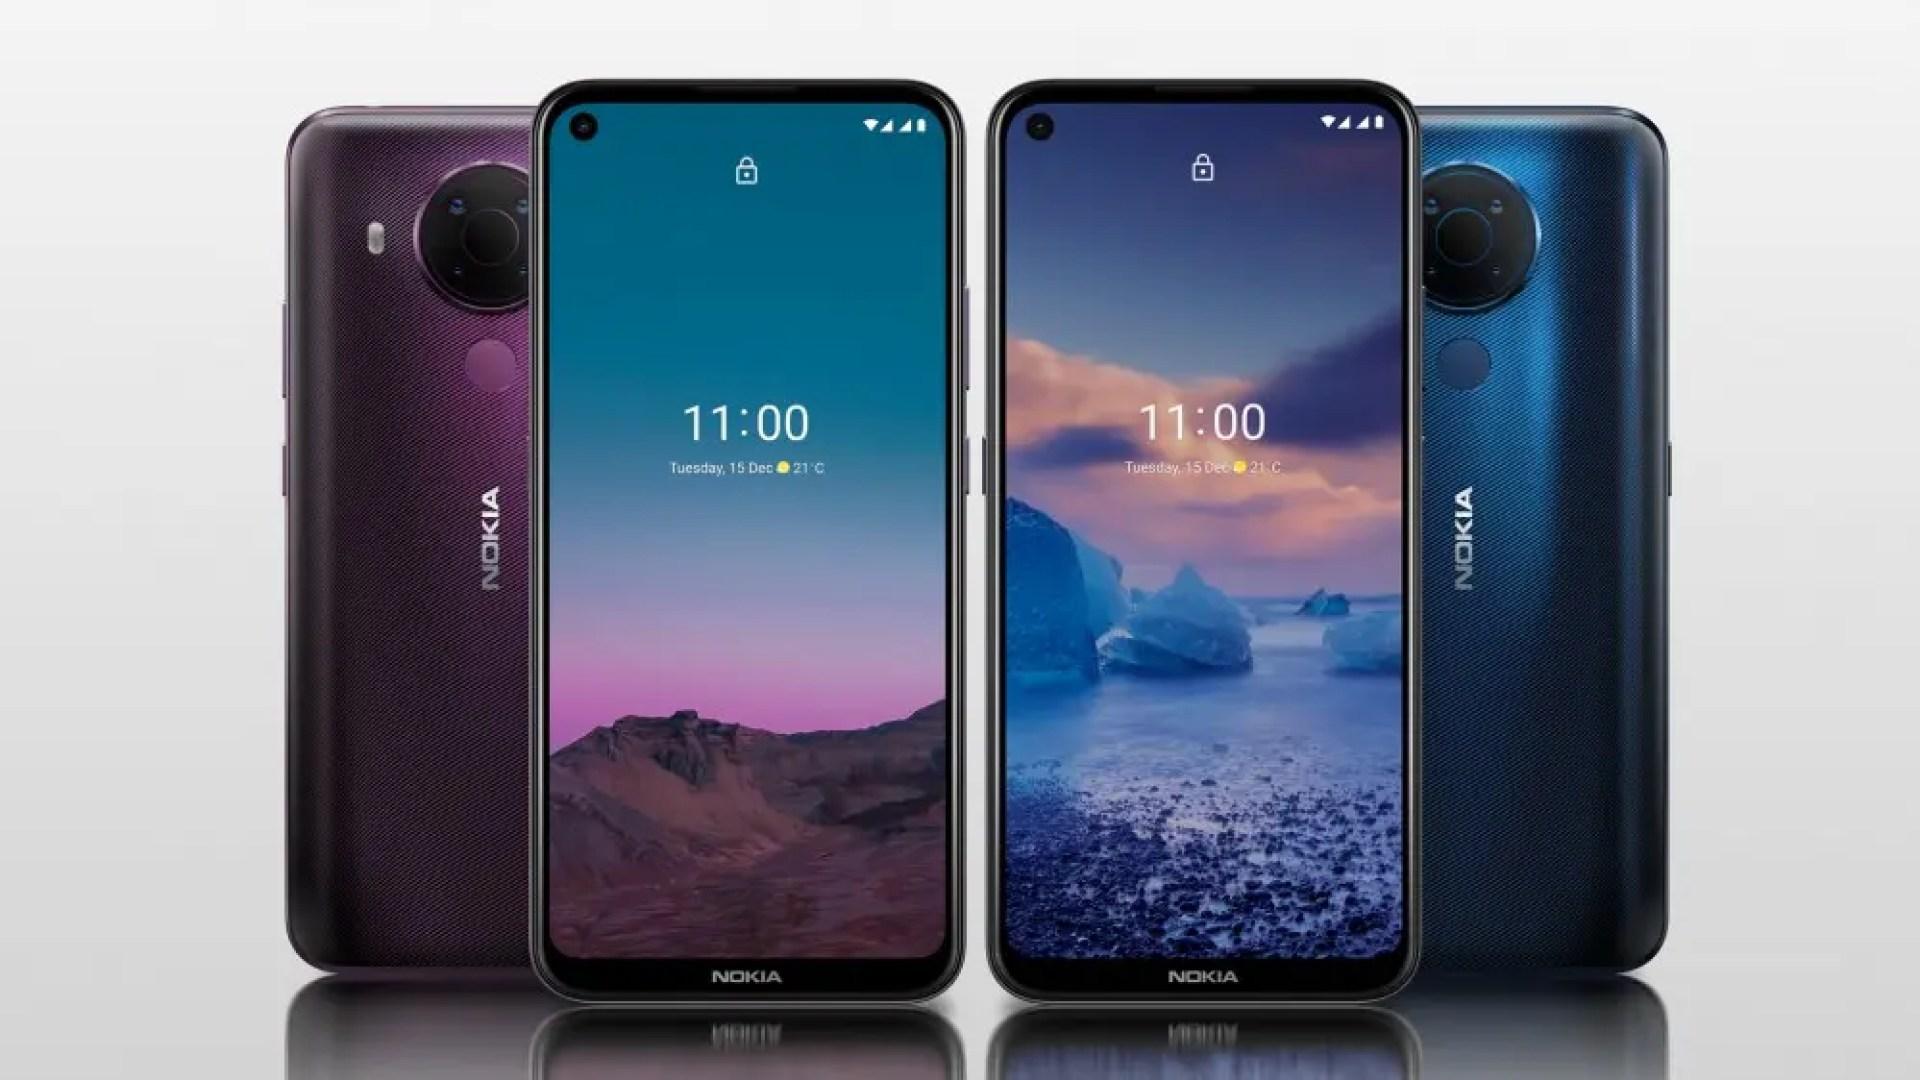 Nokia 5.4 smartphones against gray background